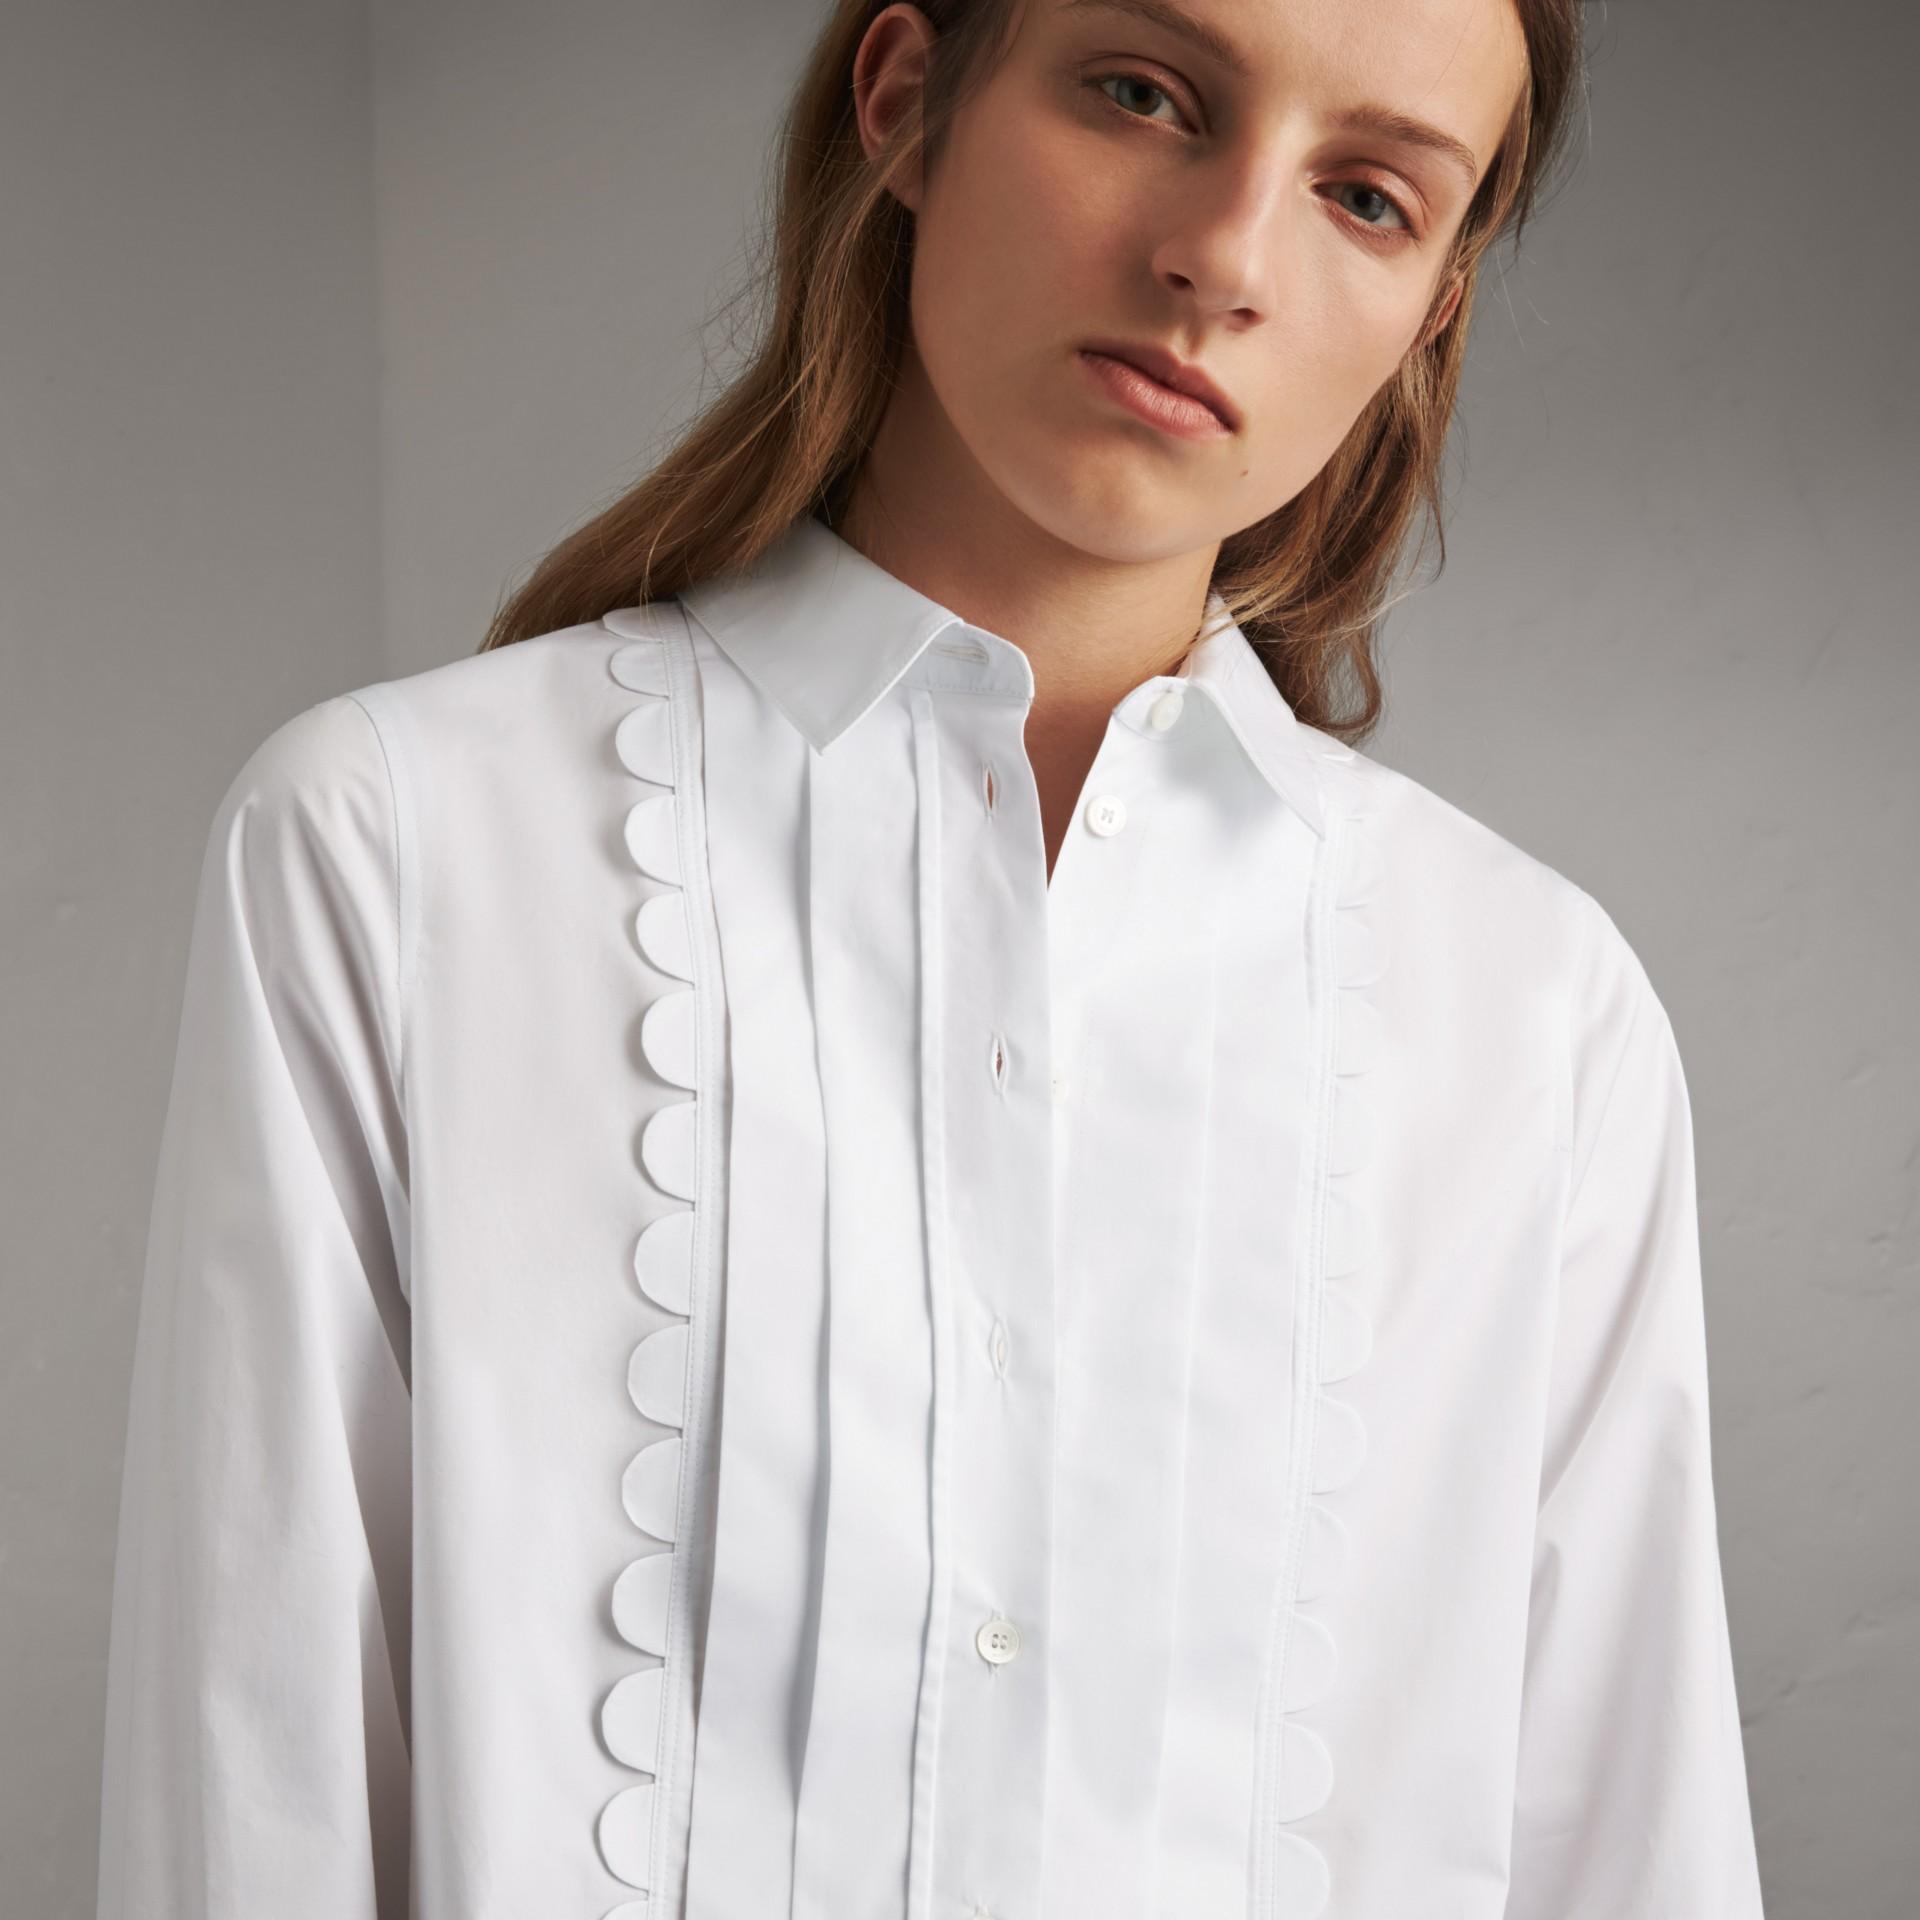 Pintuck Bib Scallop Detail Cotton Shirt - gallery image 5